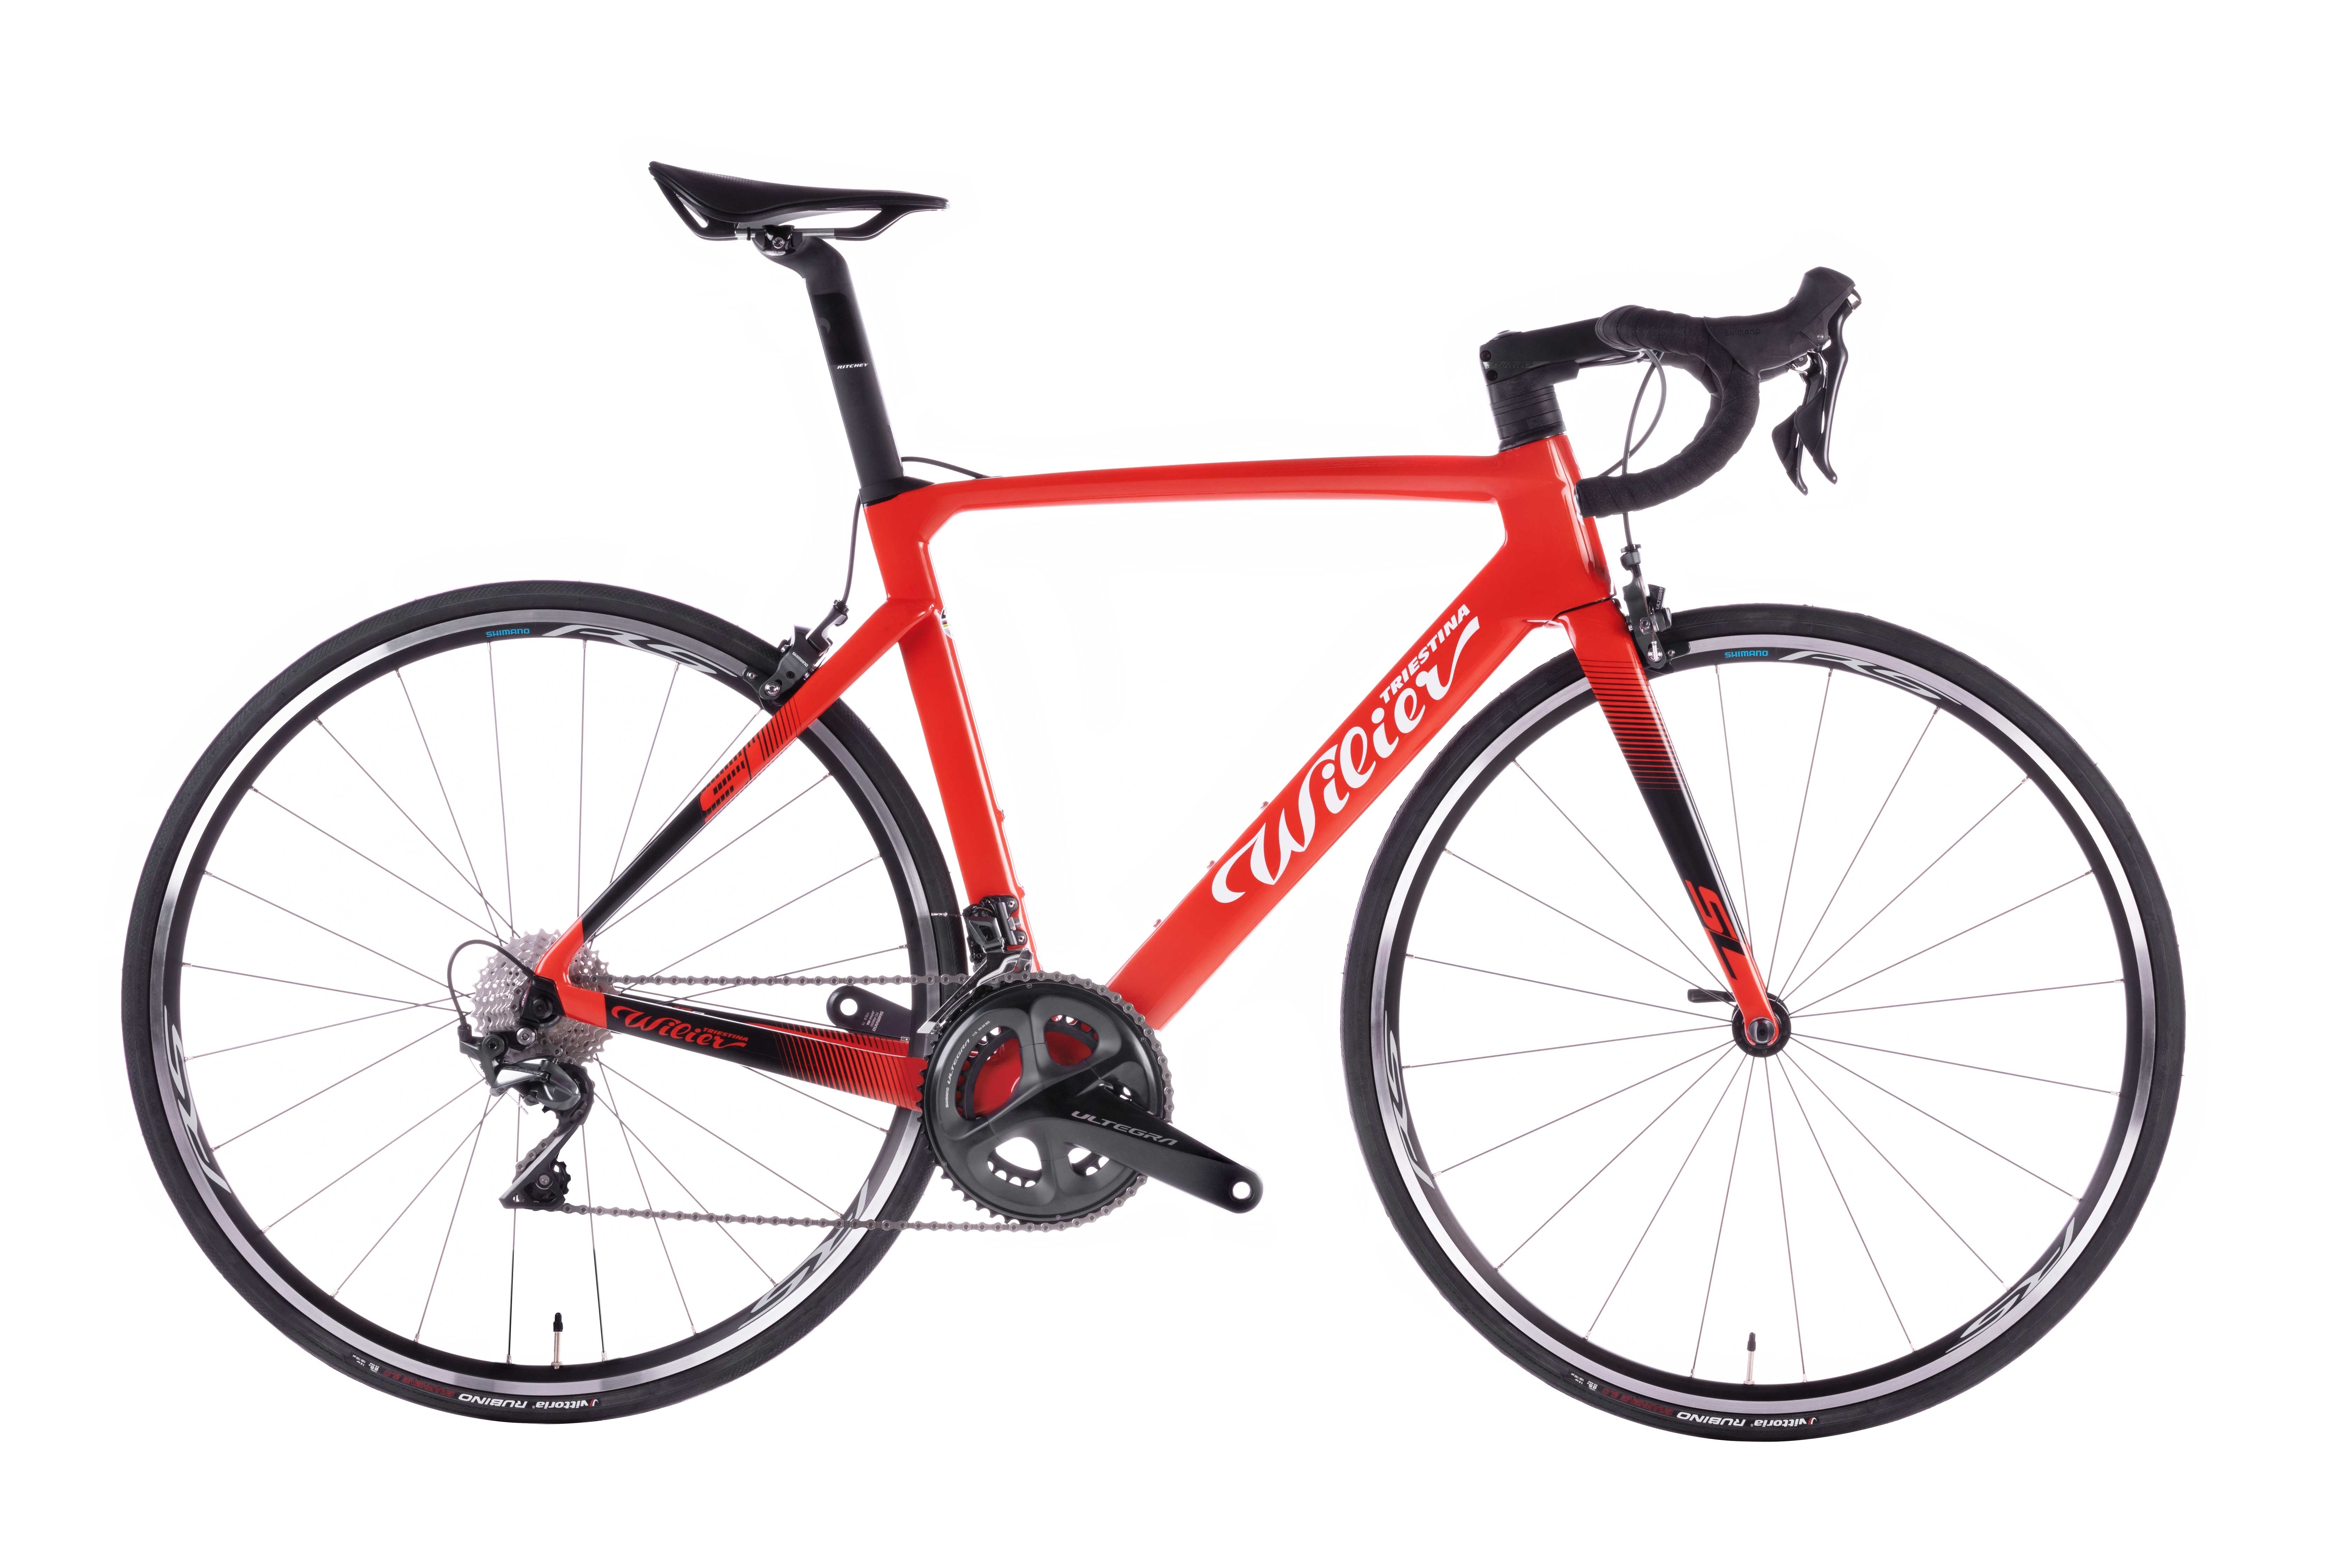 kolo CENTO10 SL Rim+ULTEGRA + RS100 red black  XL